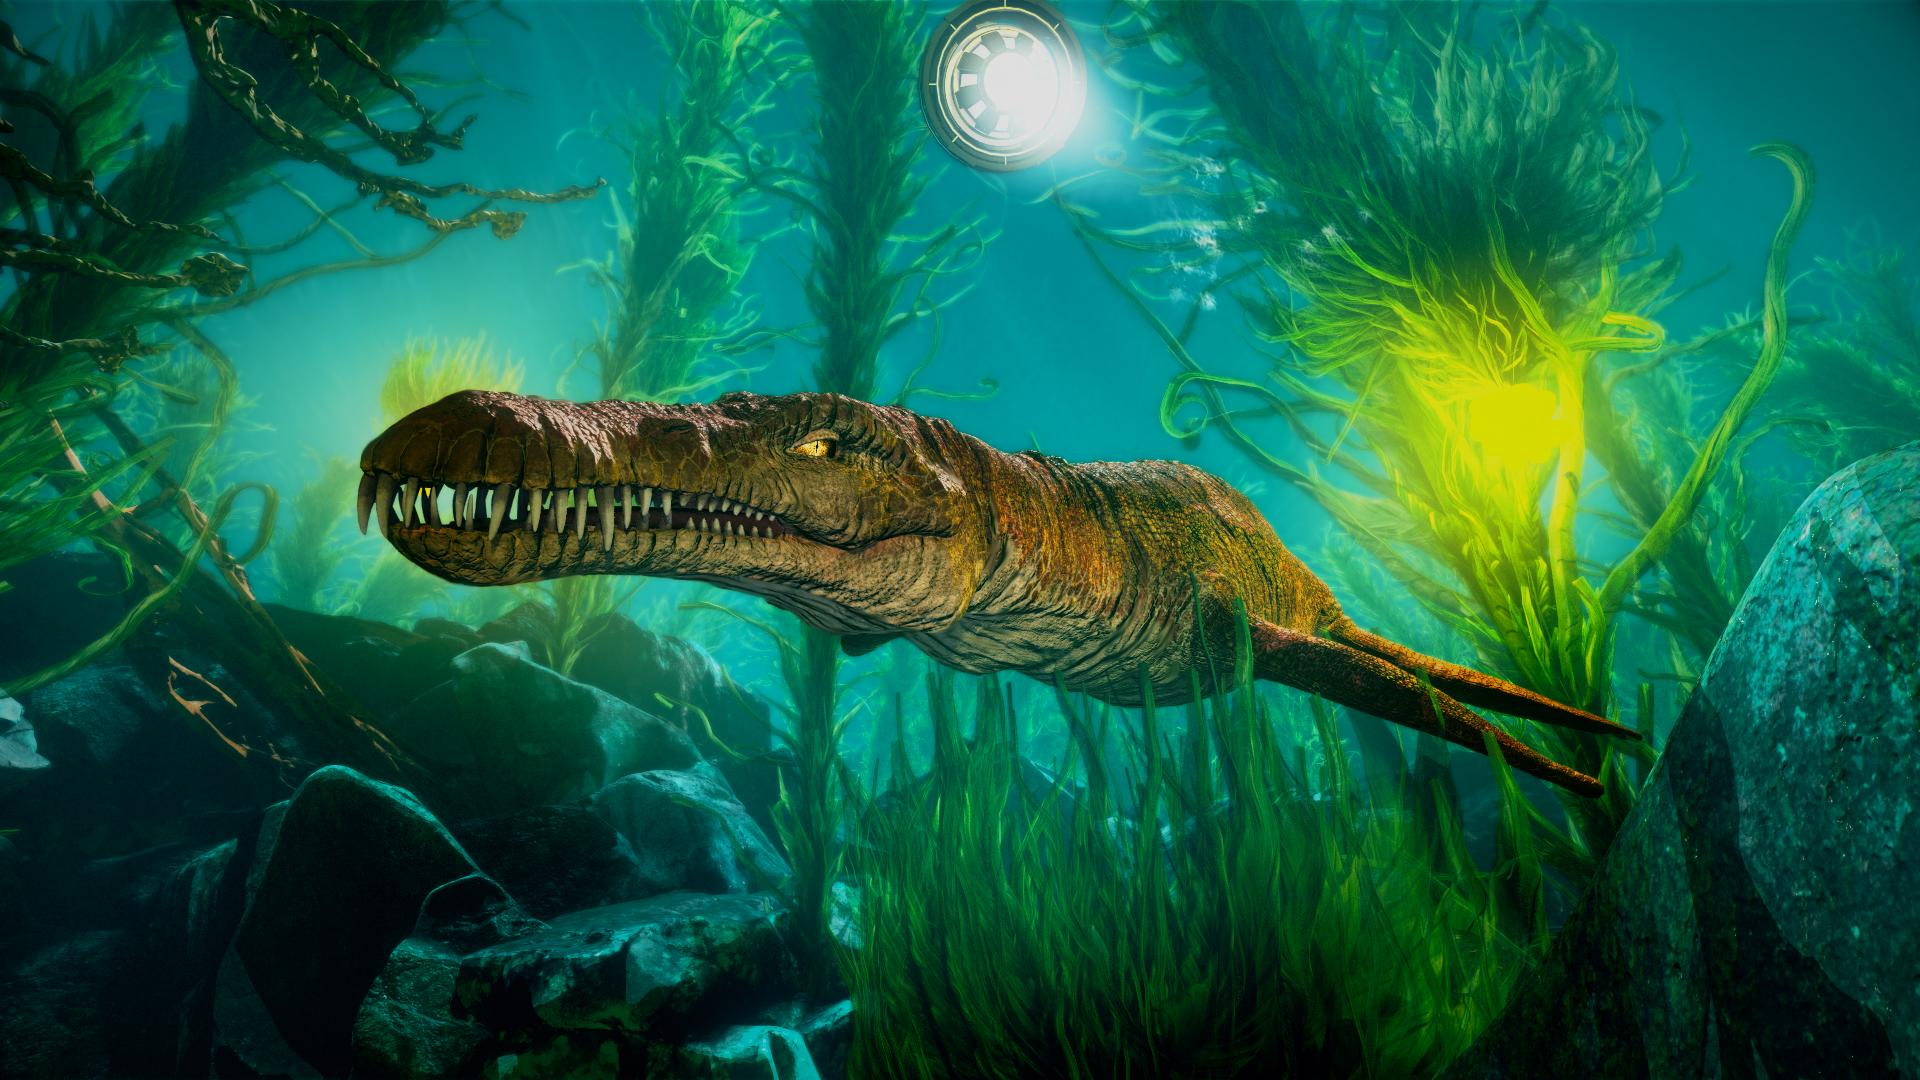 Kraken Unleashed Virtual Reality at SeaWorld Orlando